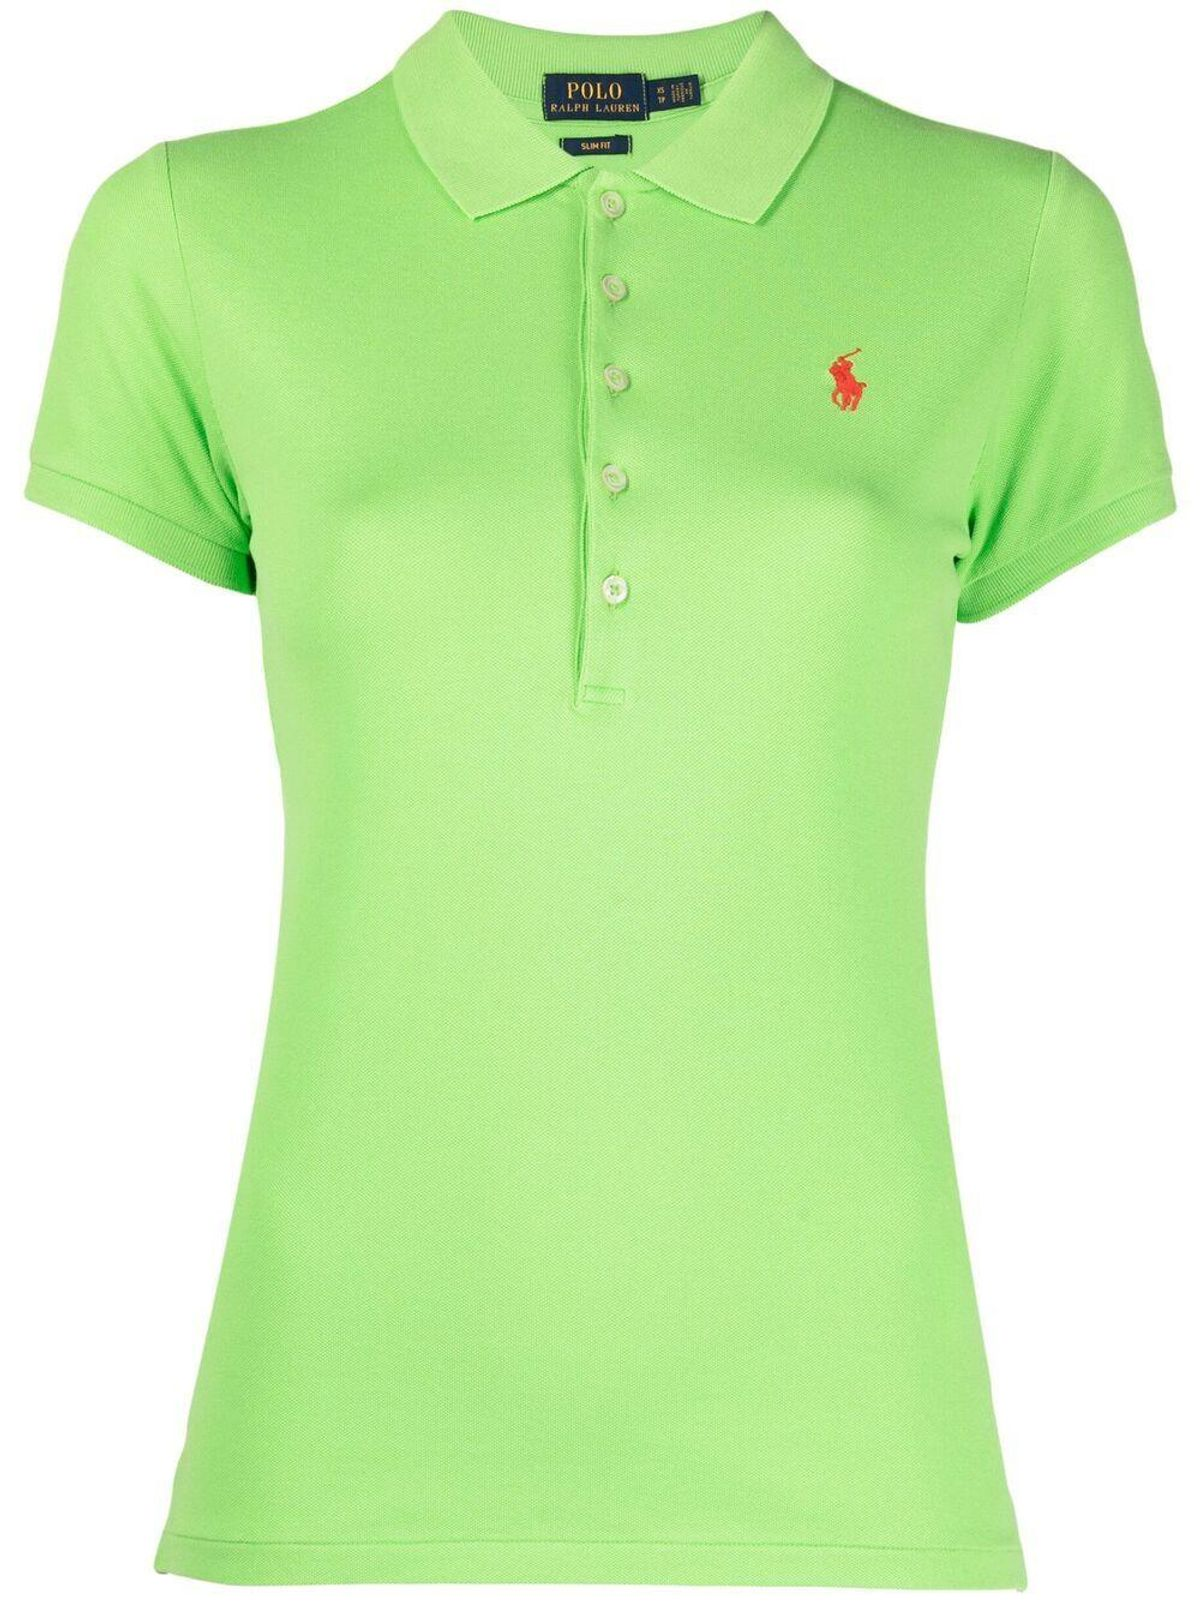 Polo Pony Polo Shirt